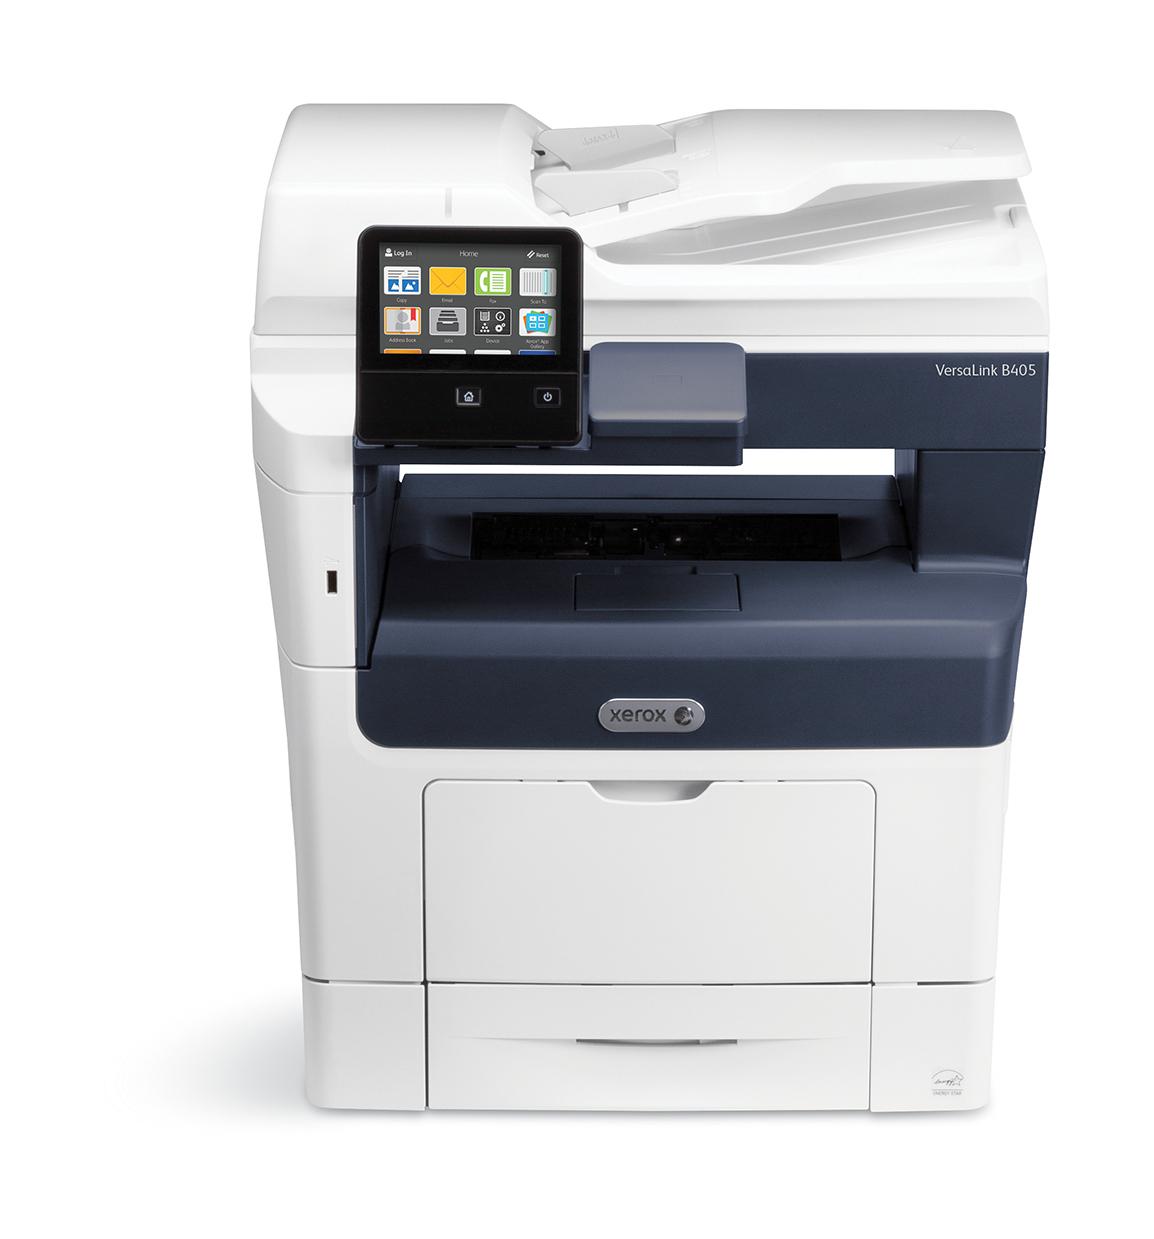 Xerox VersaLink B405 A4 45 ppm dúplex copia/impresión/escaneado sin contrato PS3 PCL5e/6 2 bandejas Total 700 hojas